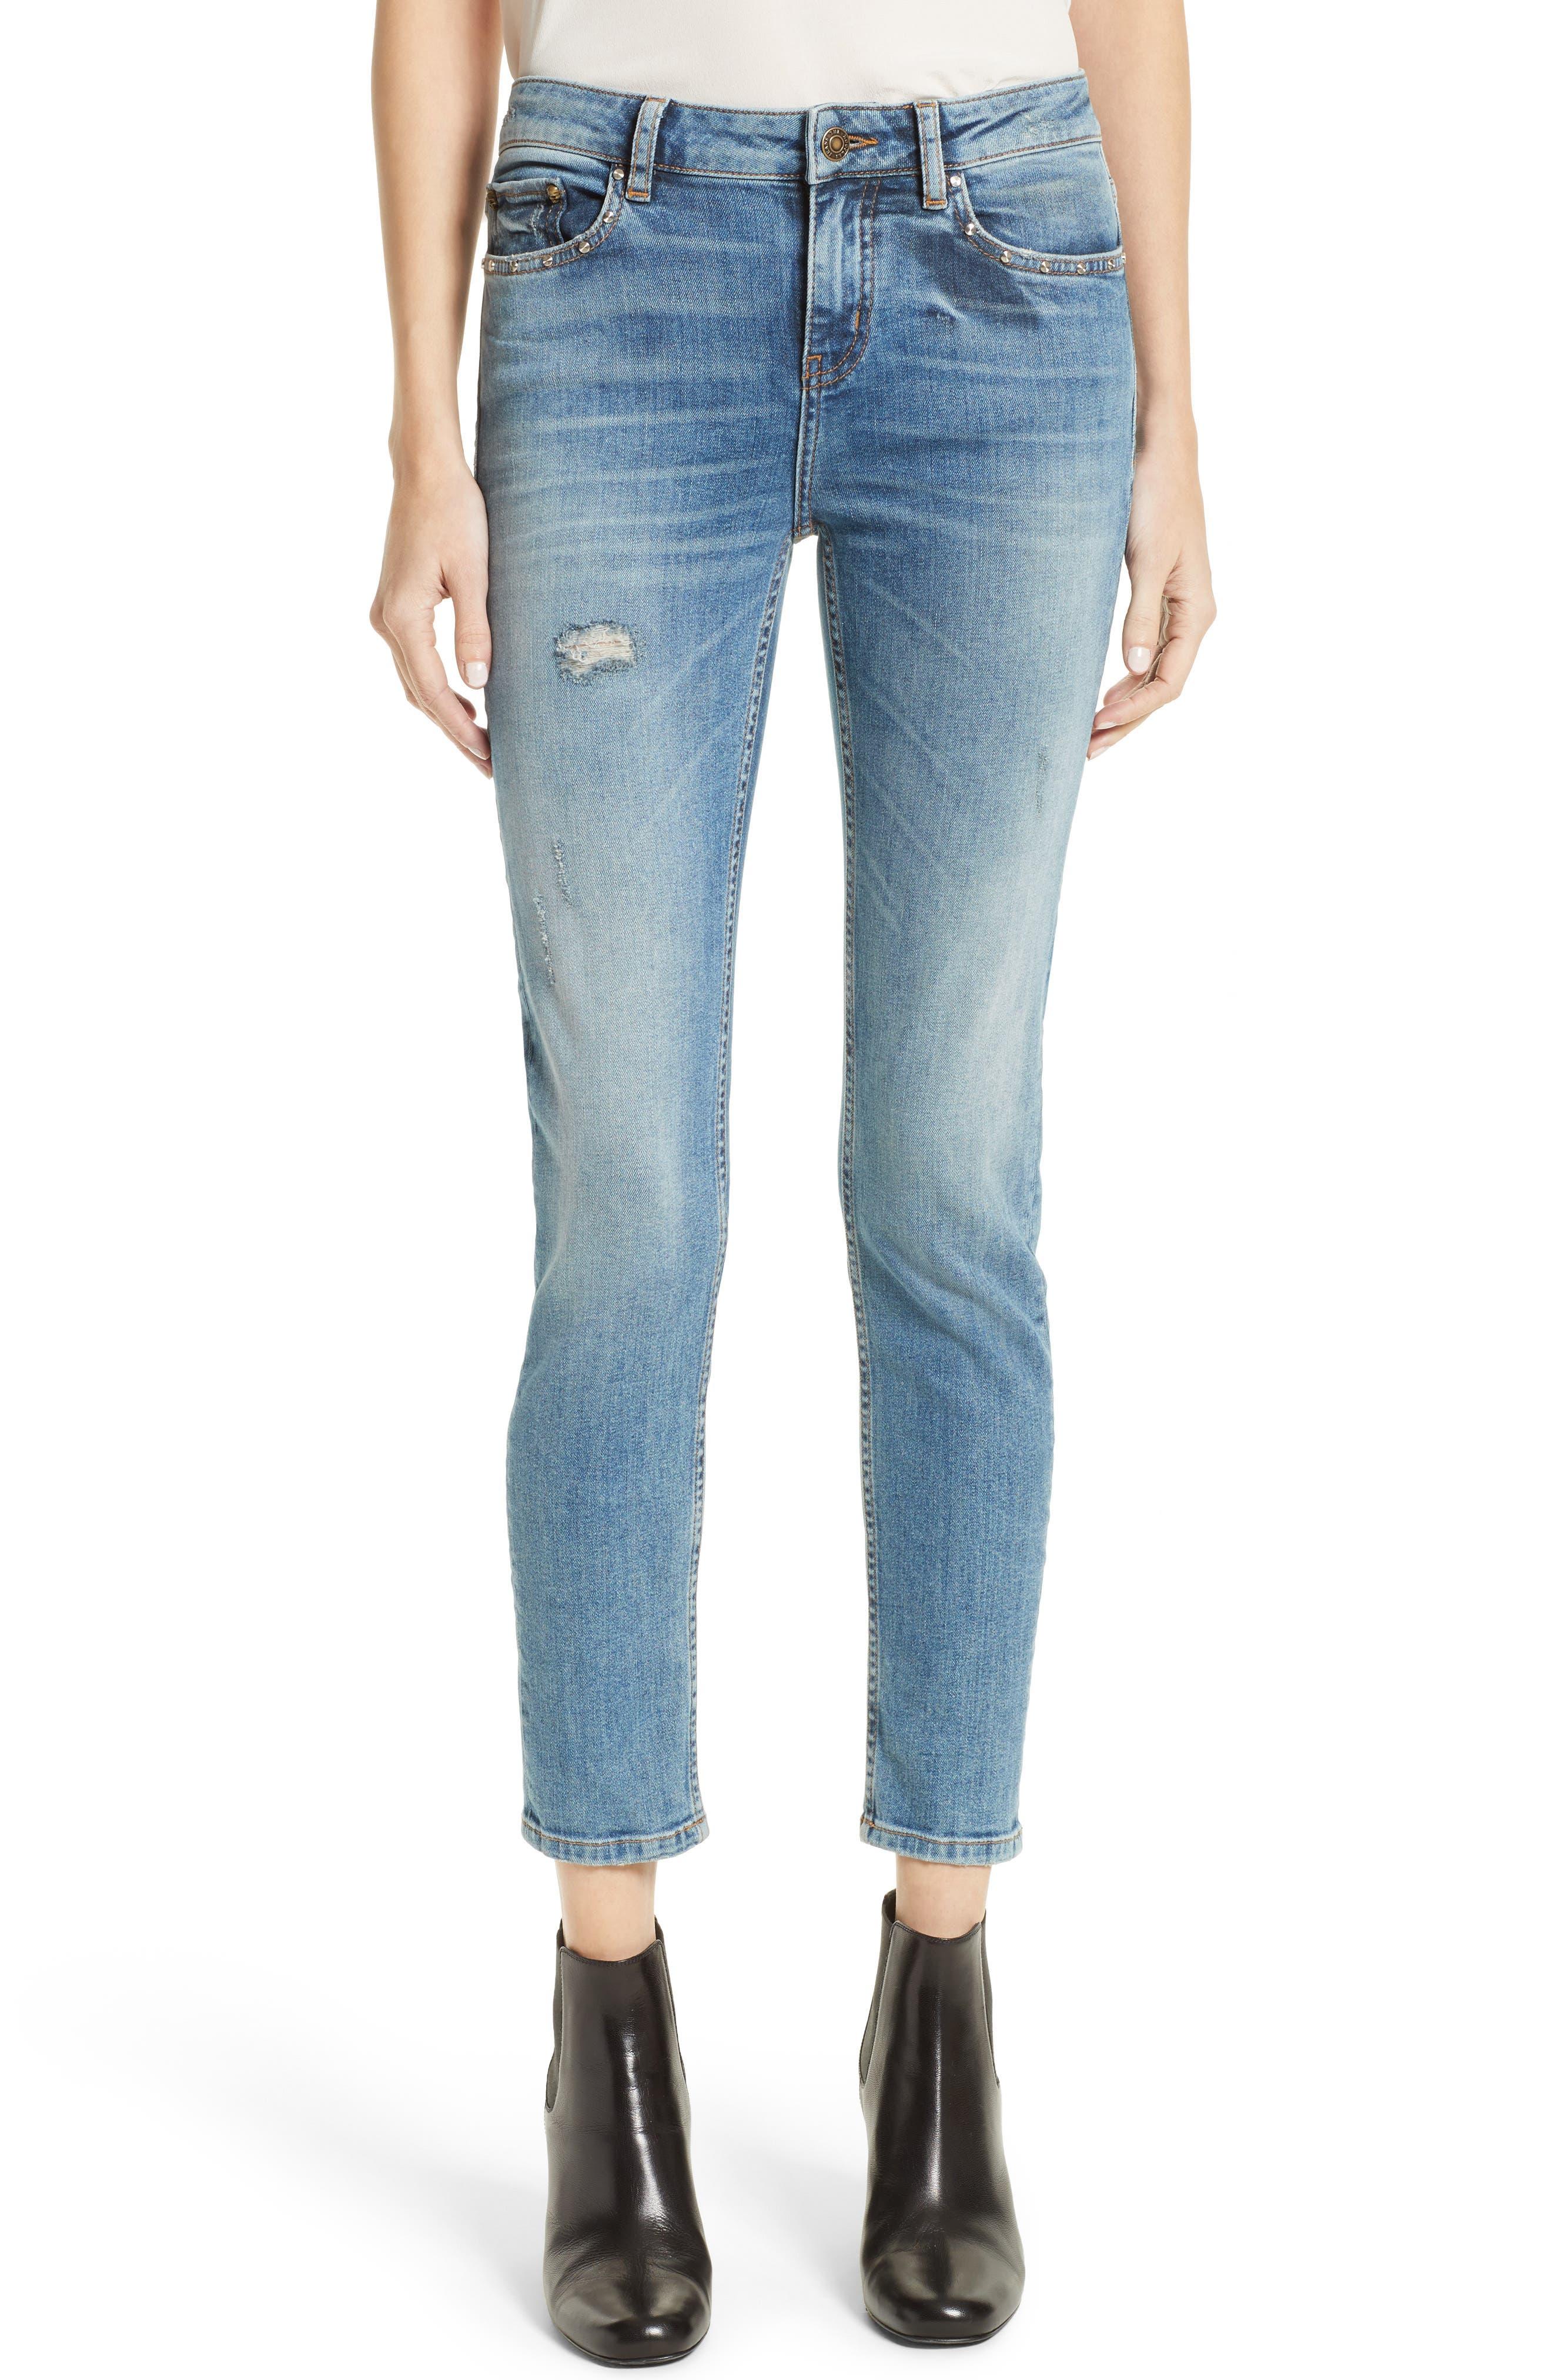 The Kooples Blue Billy Crop Skinny Jeans